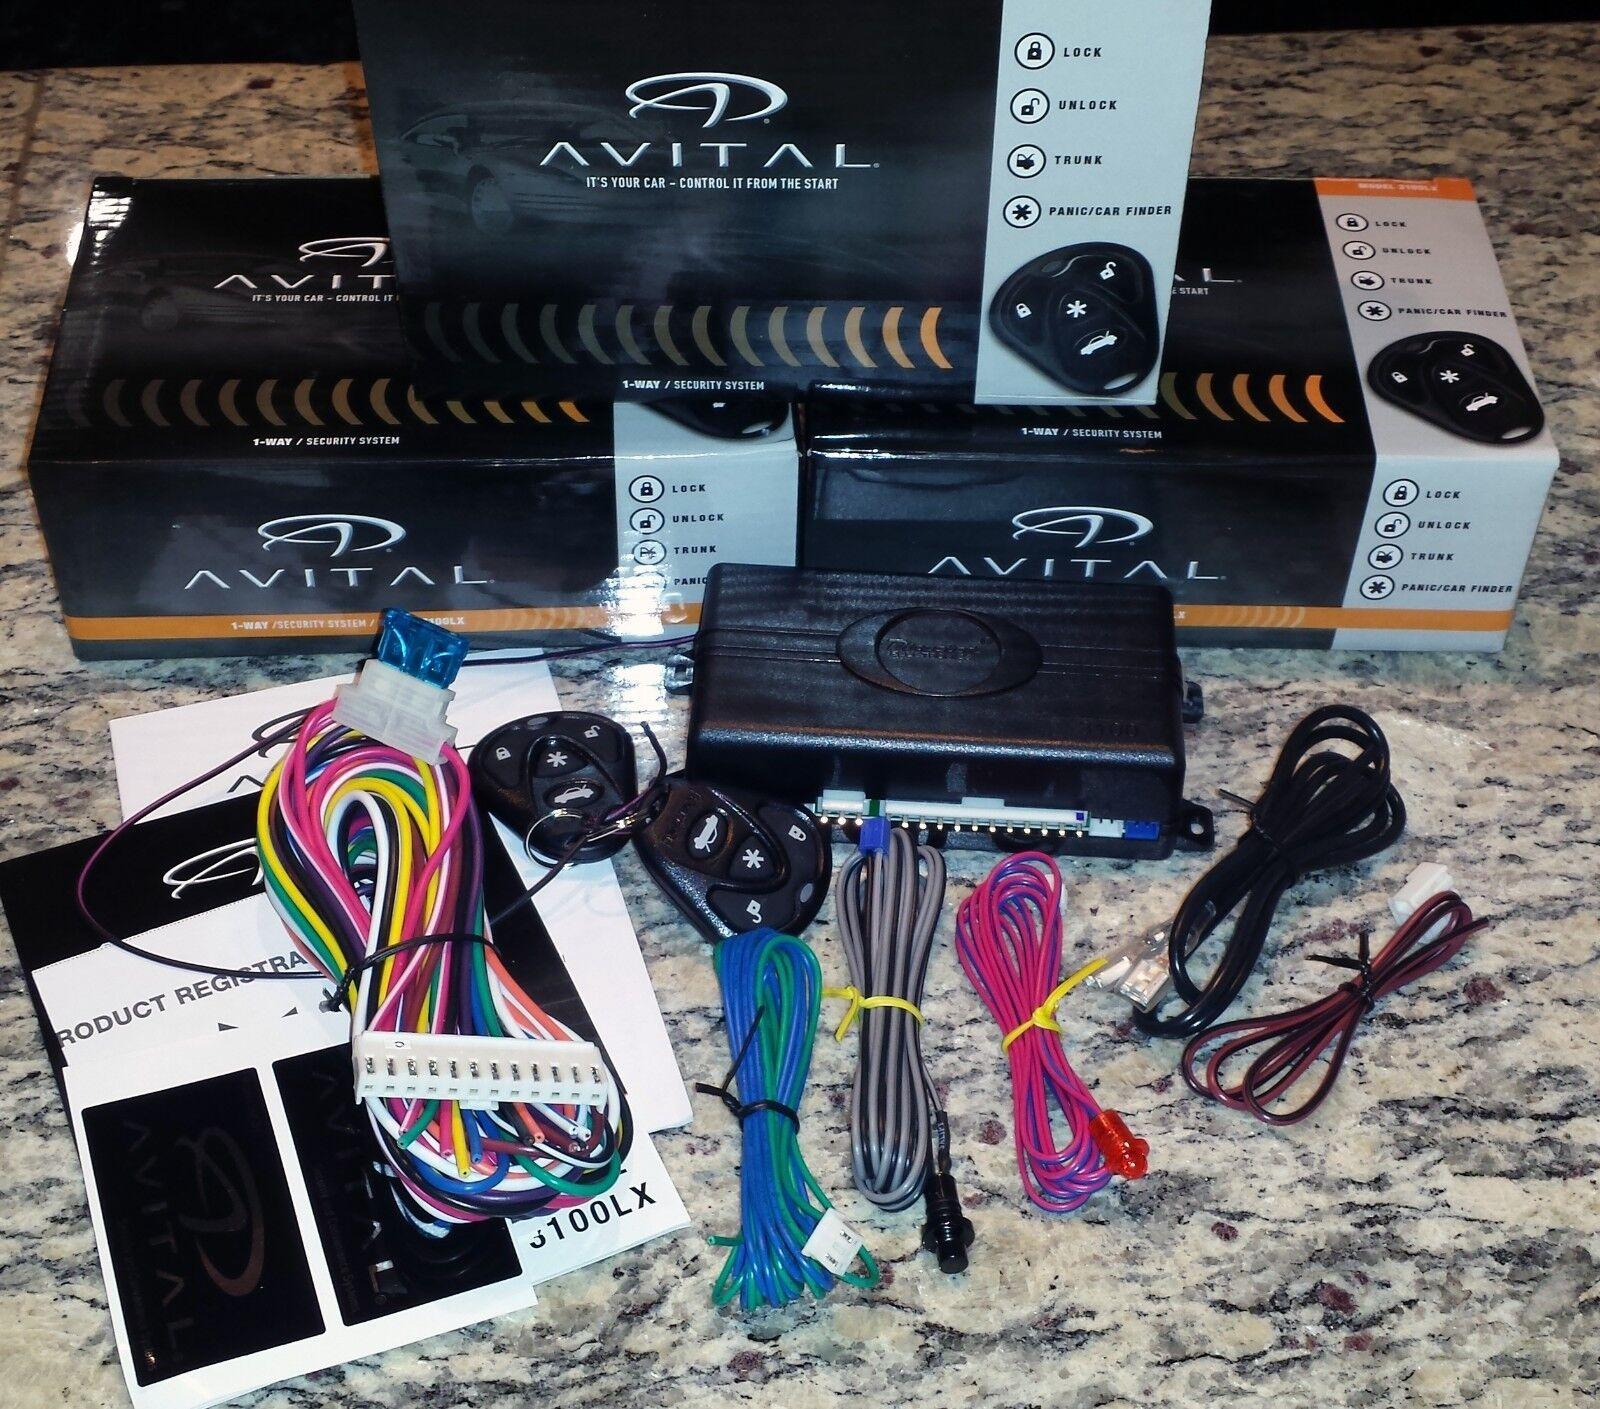 Avital 3100lx 3 Channel Car Alarm System W 2 Remotes And Keyless 3100 Wiring Diagram Entry